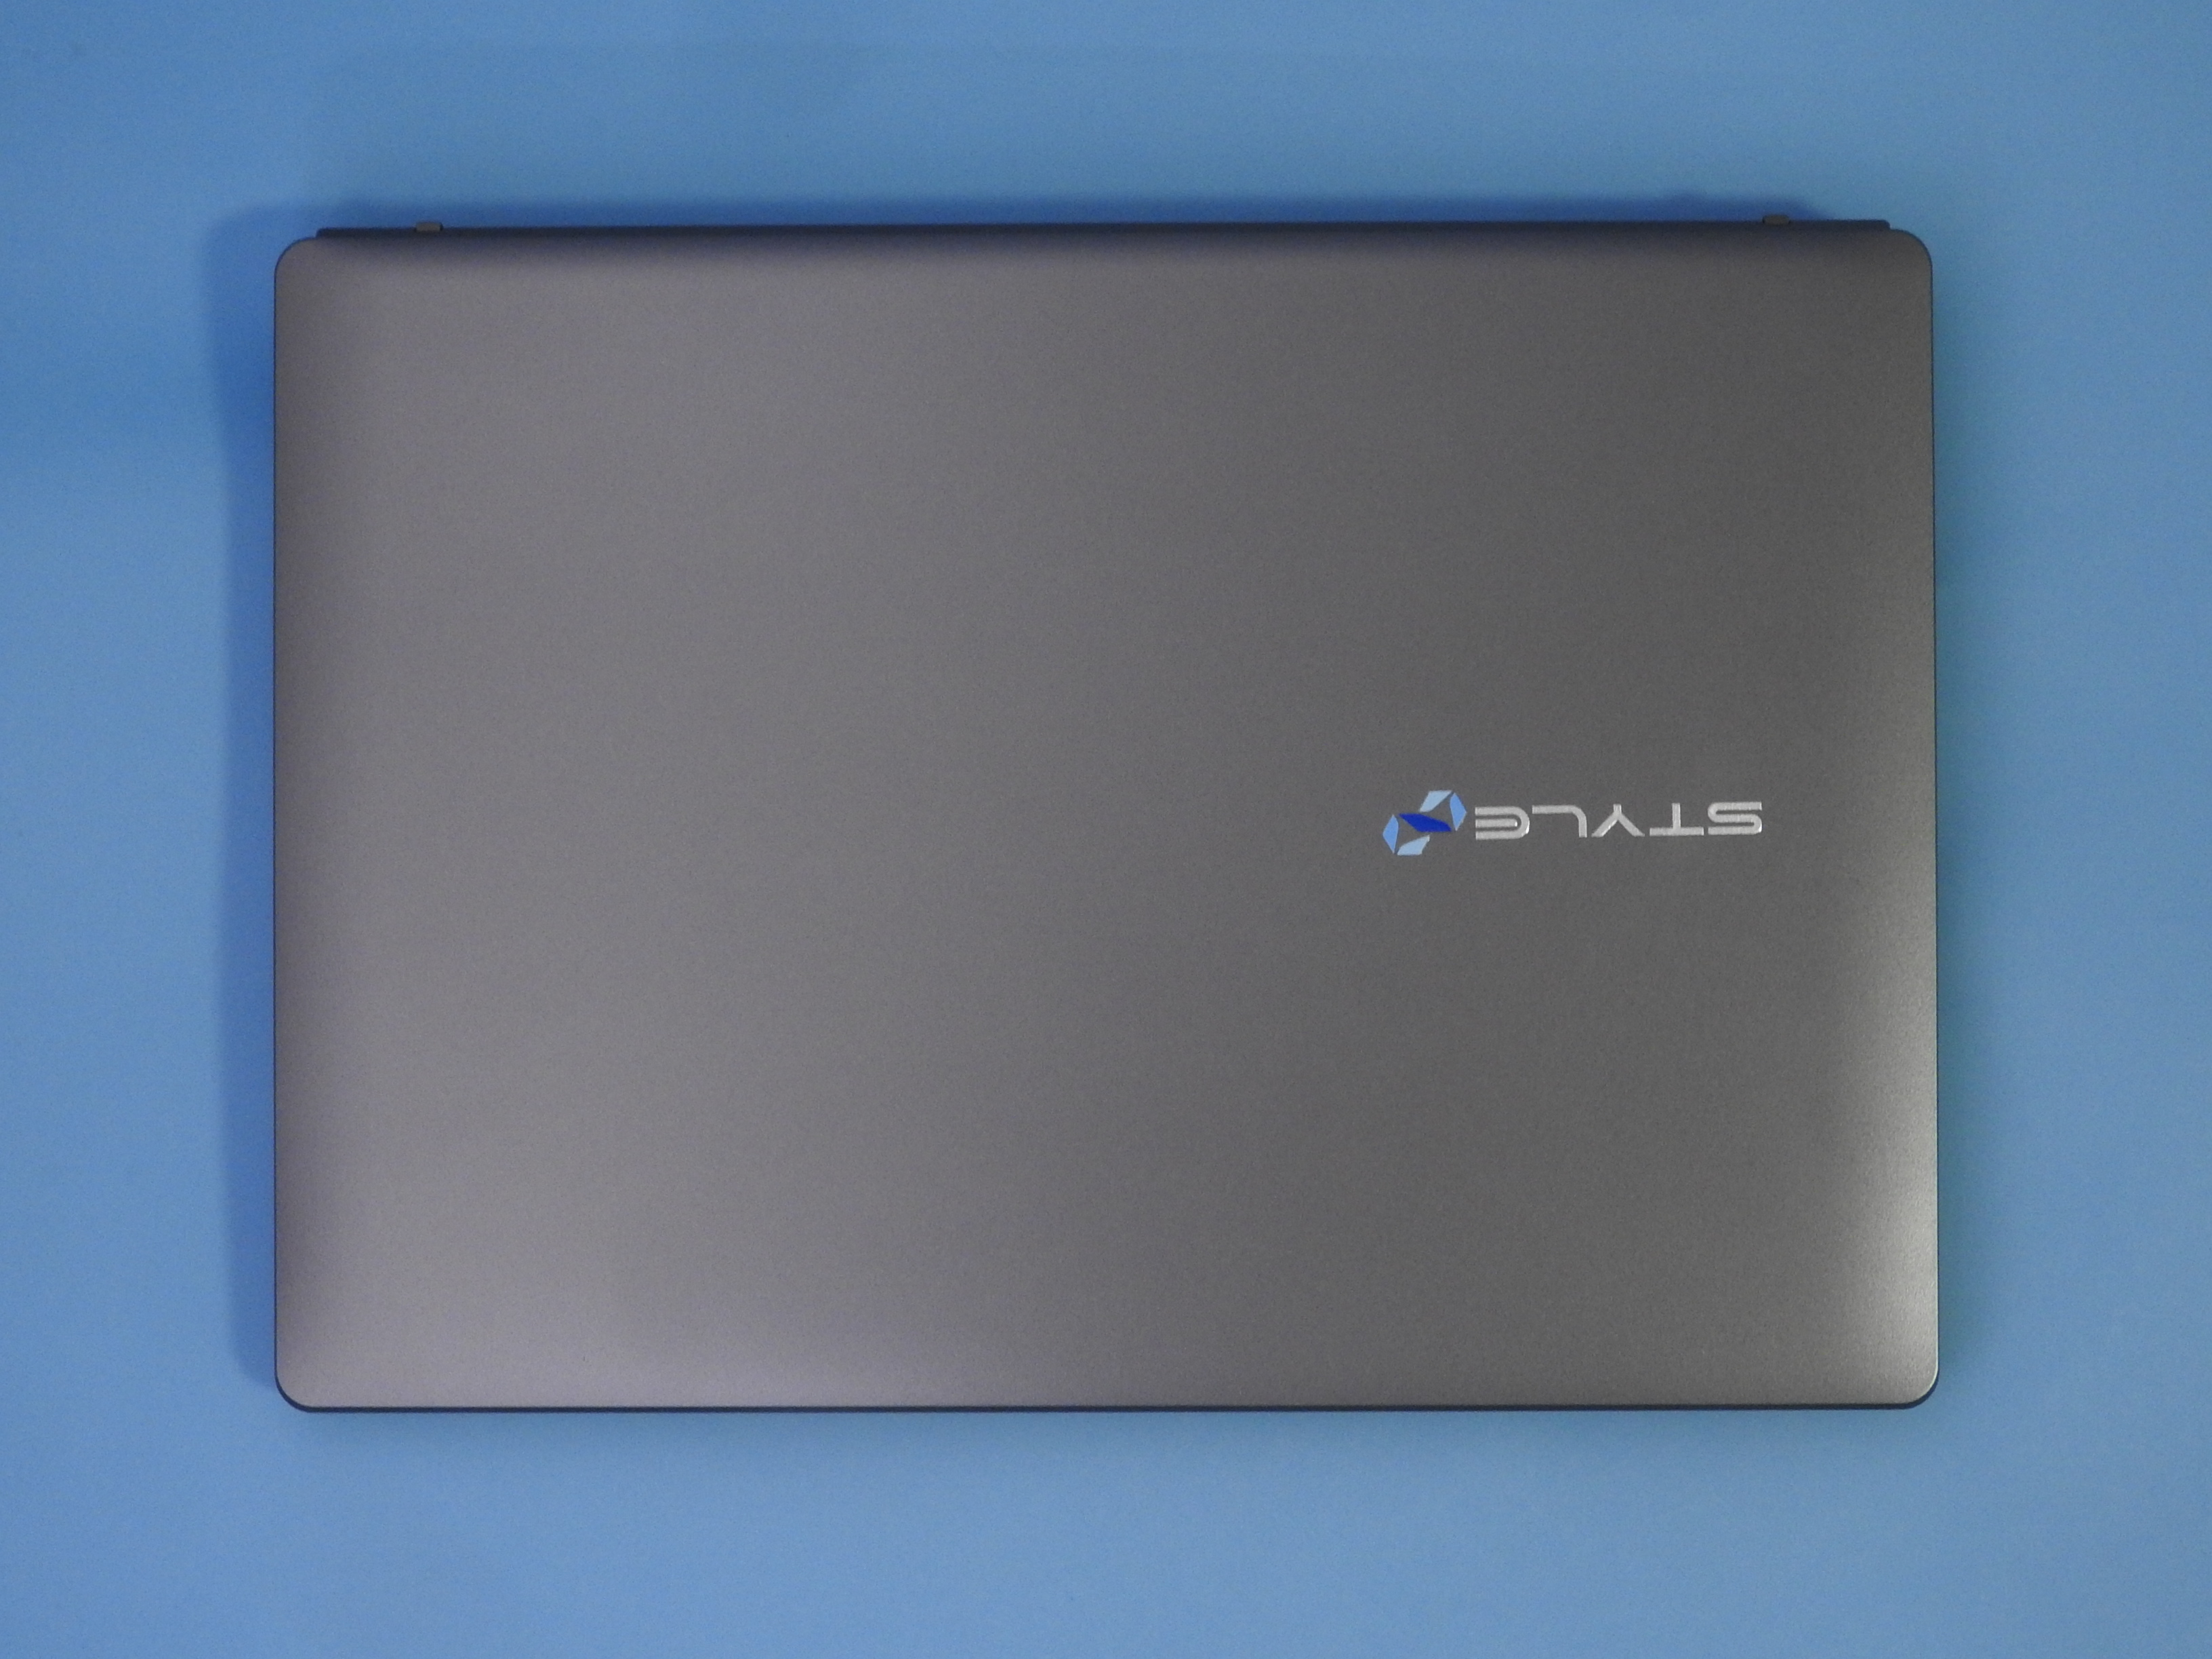 Stl-14HP012-C-CDMMの上面。シルバーを基調としたシンプルなデザインだ